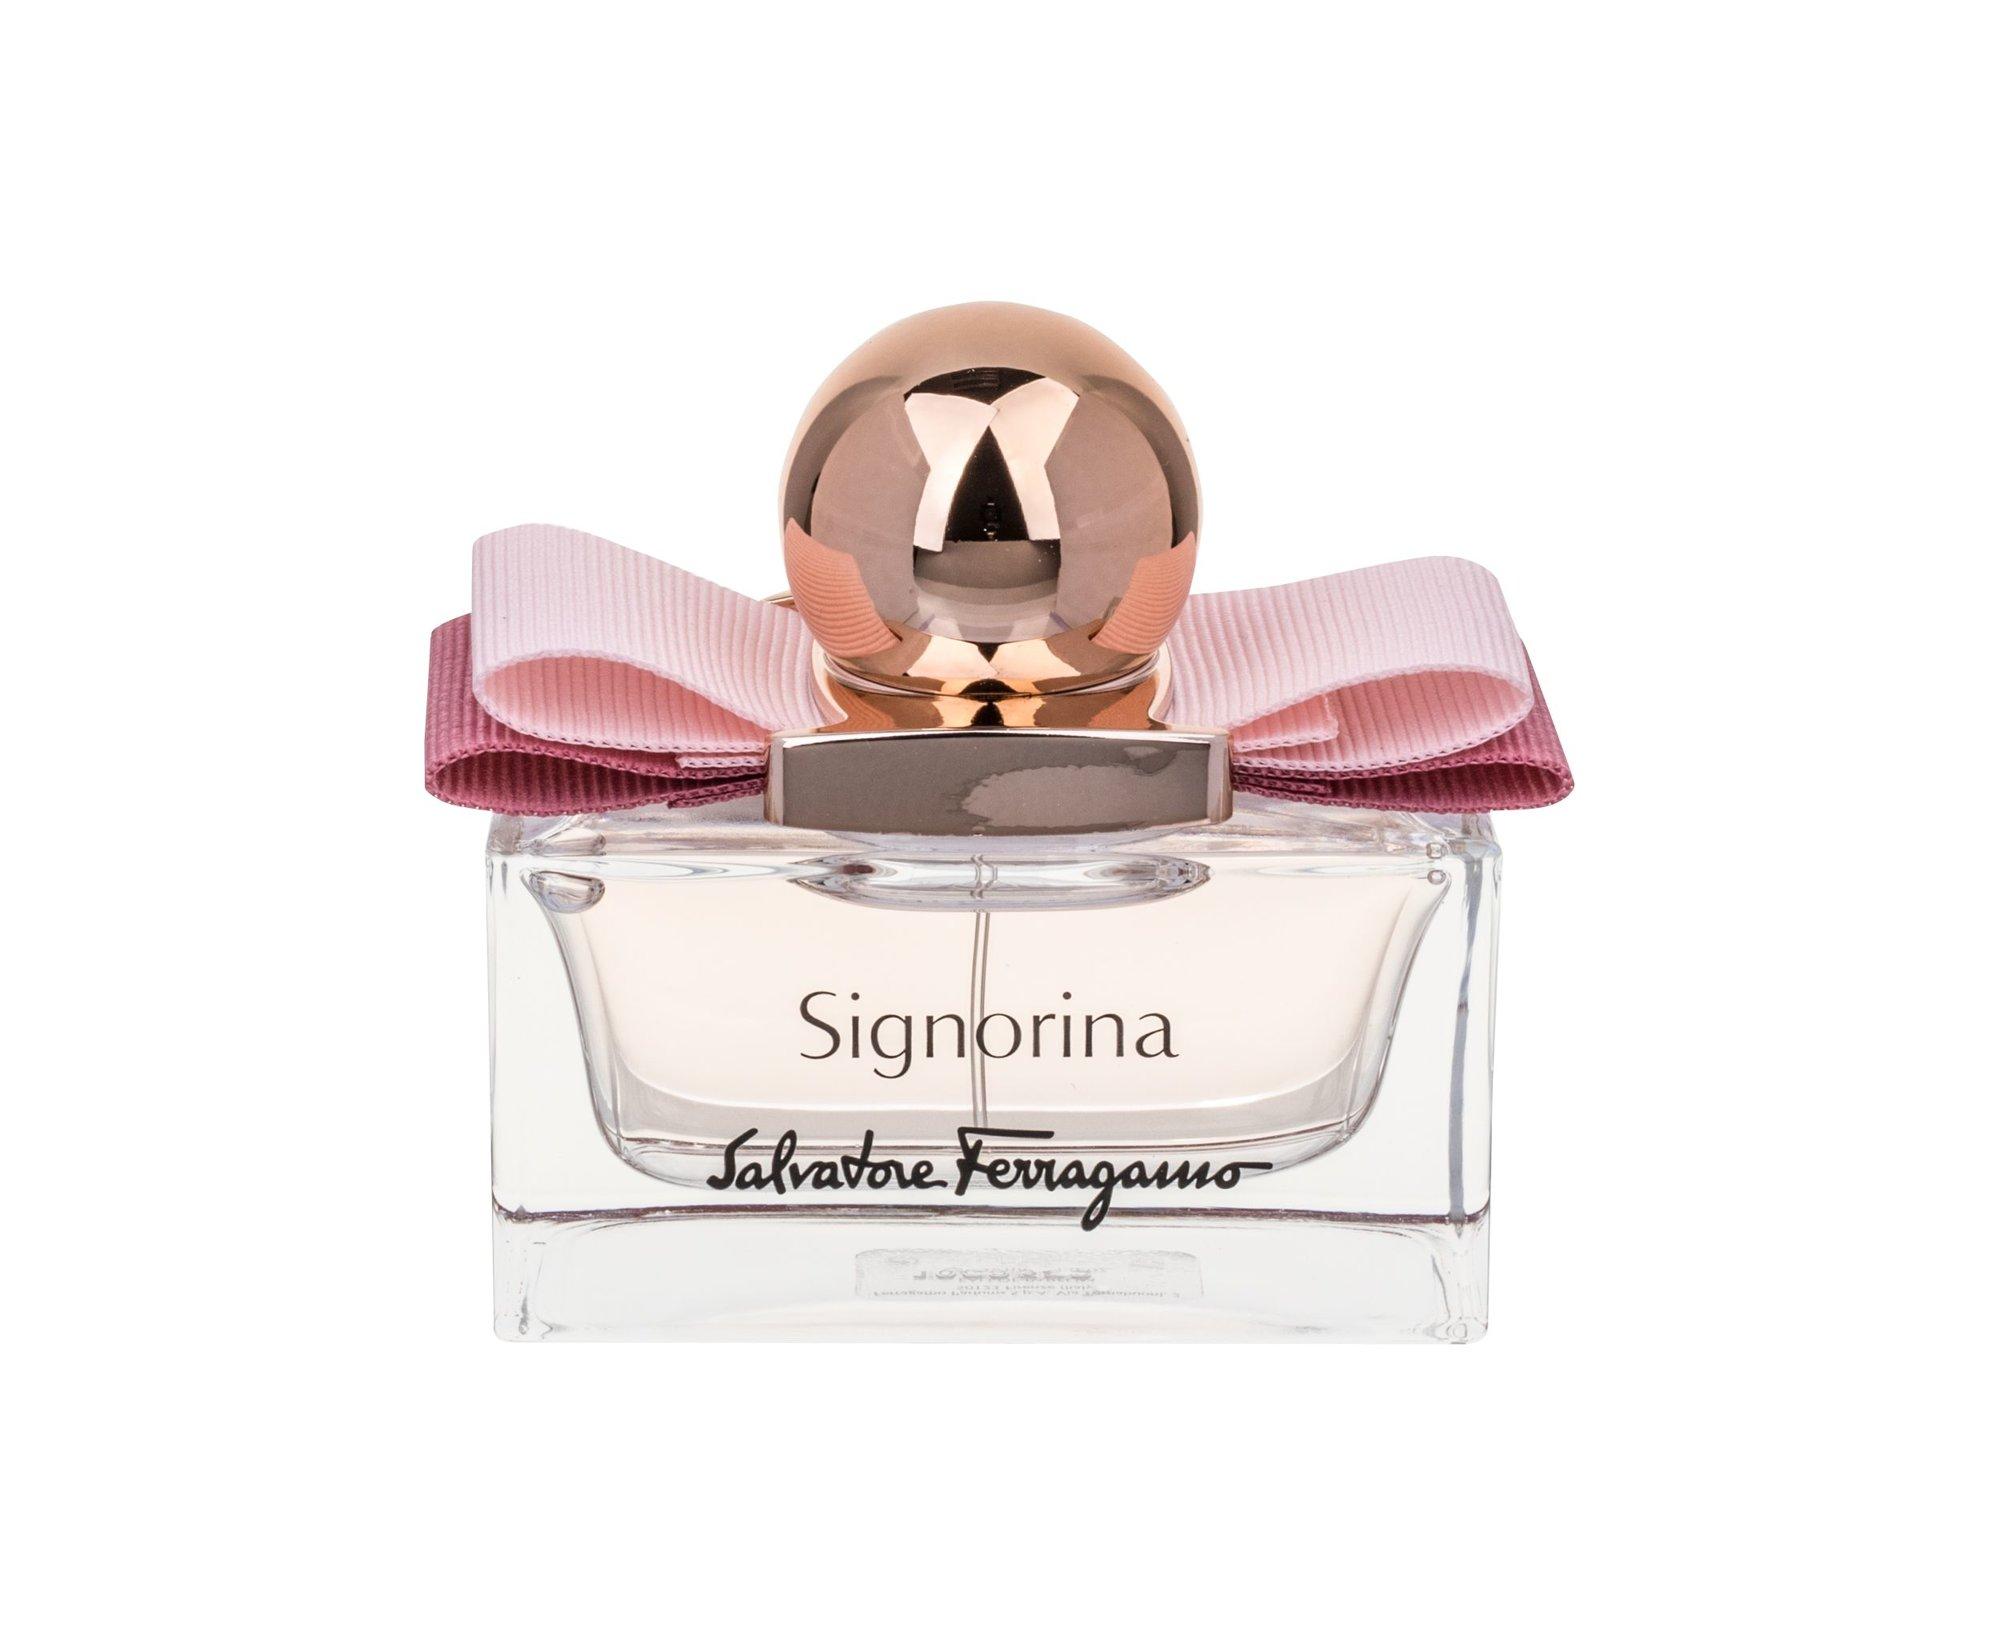 Salvatore Ferragamo Signorina Eau de Parfum 30ml